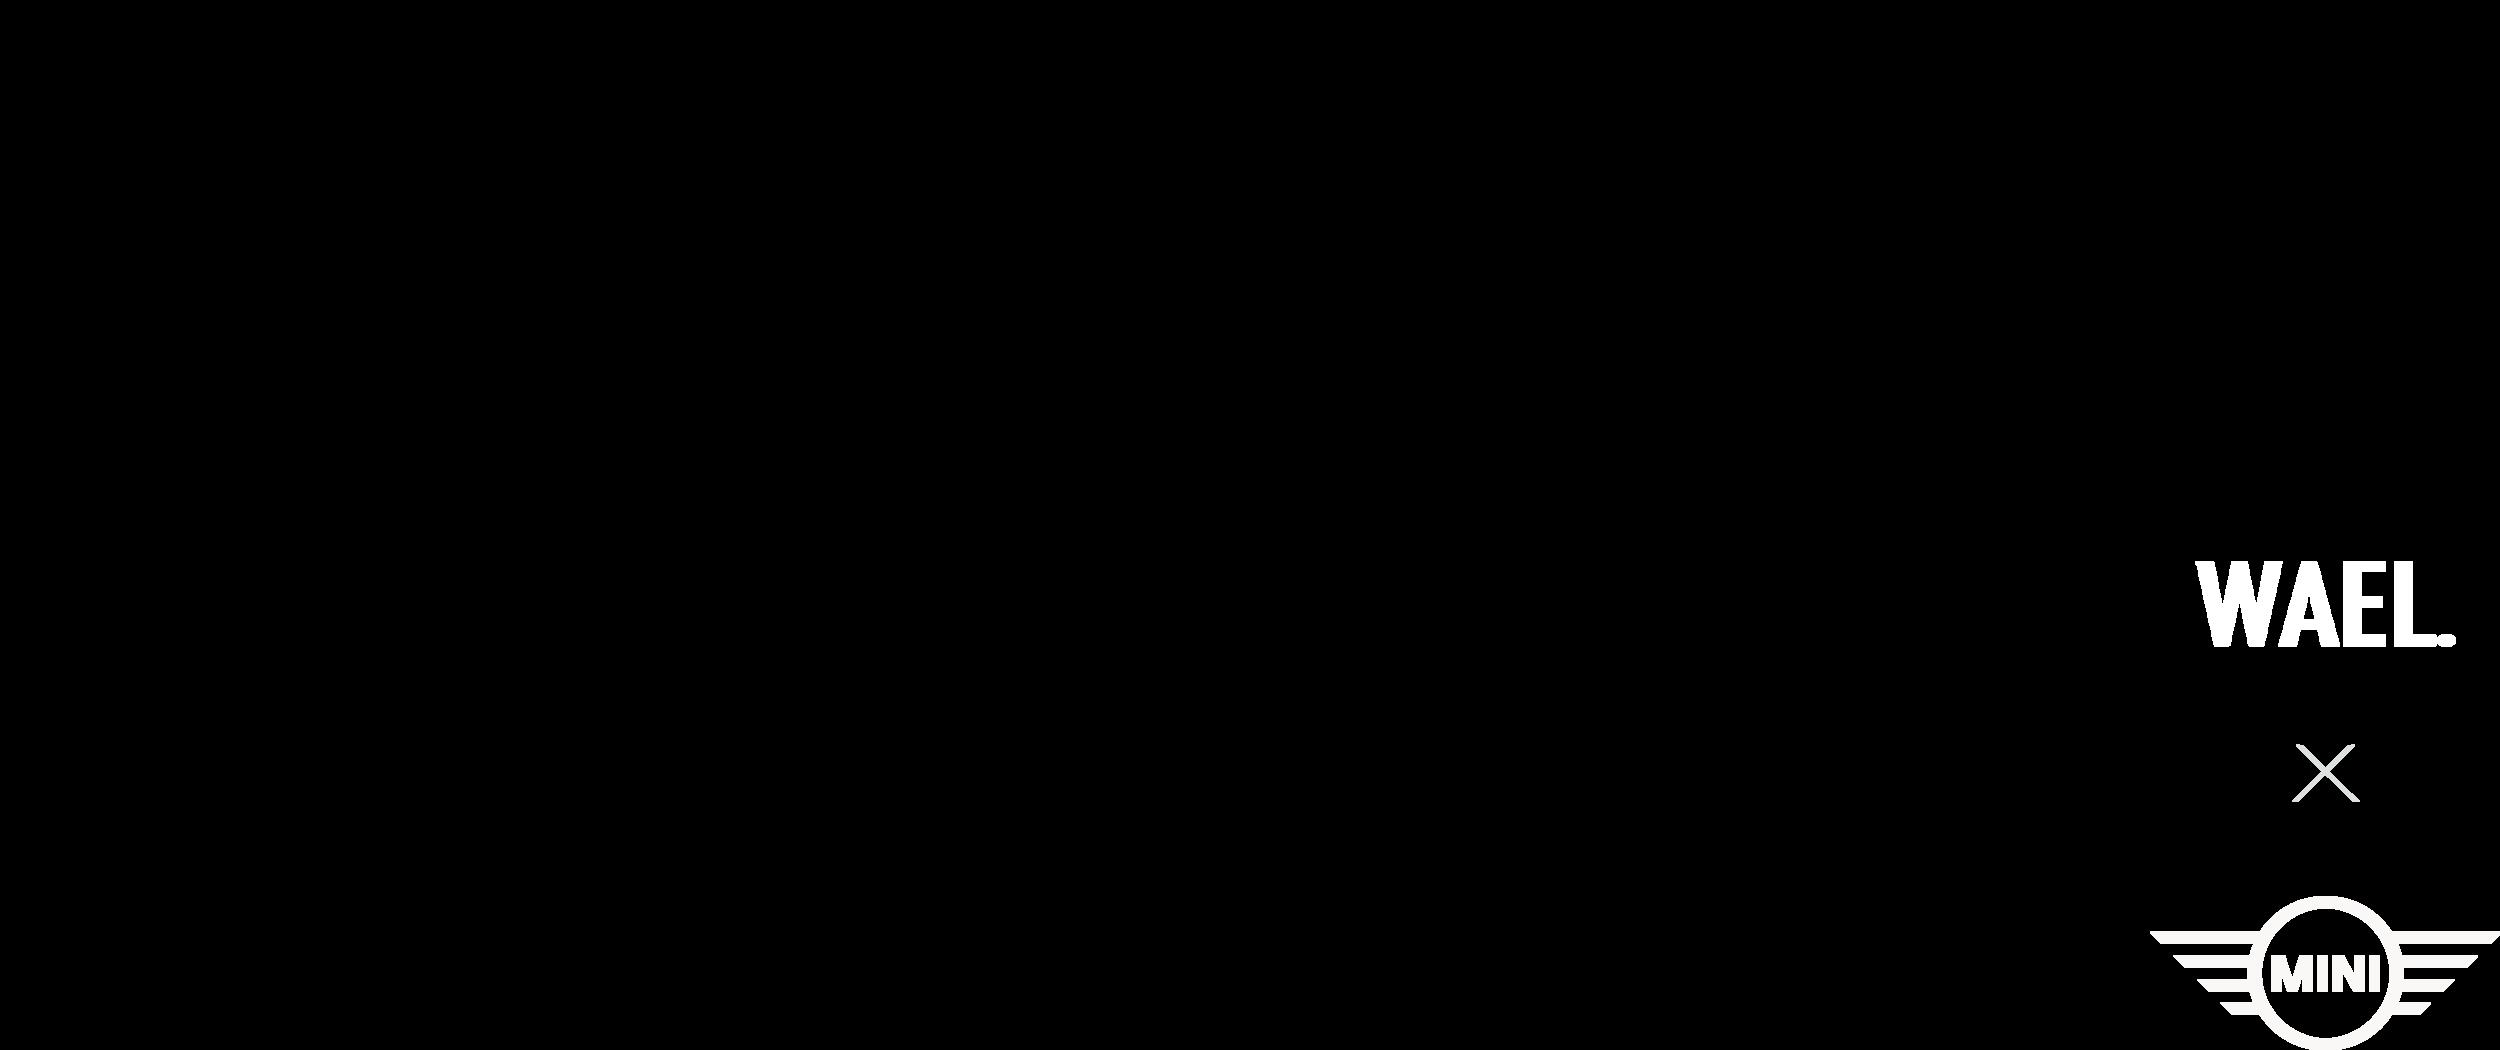 wael x mini logo